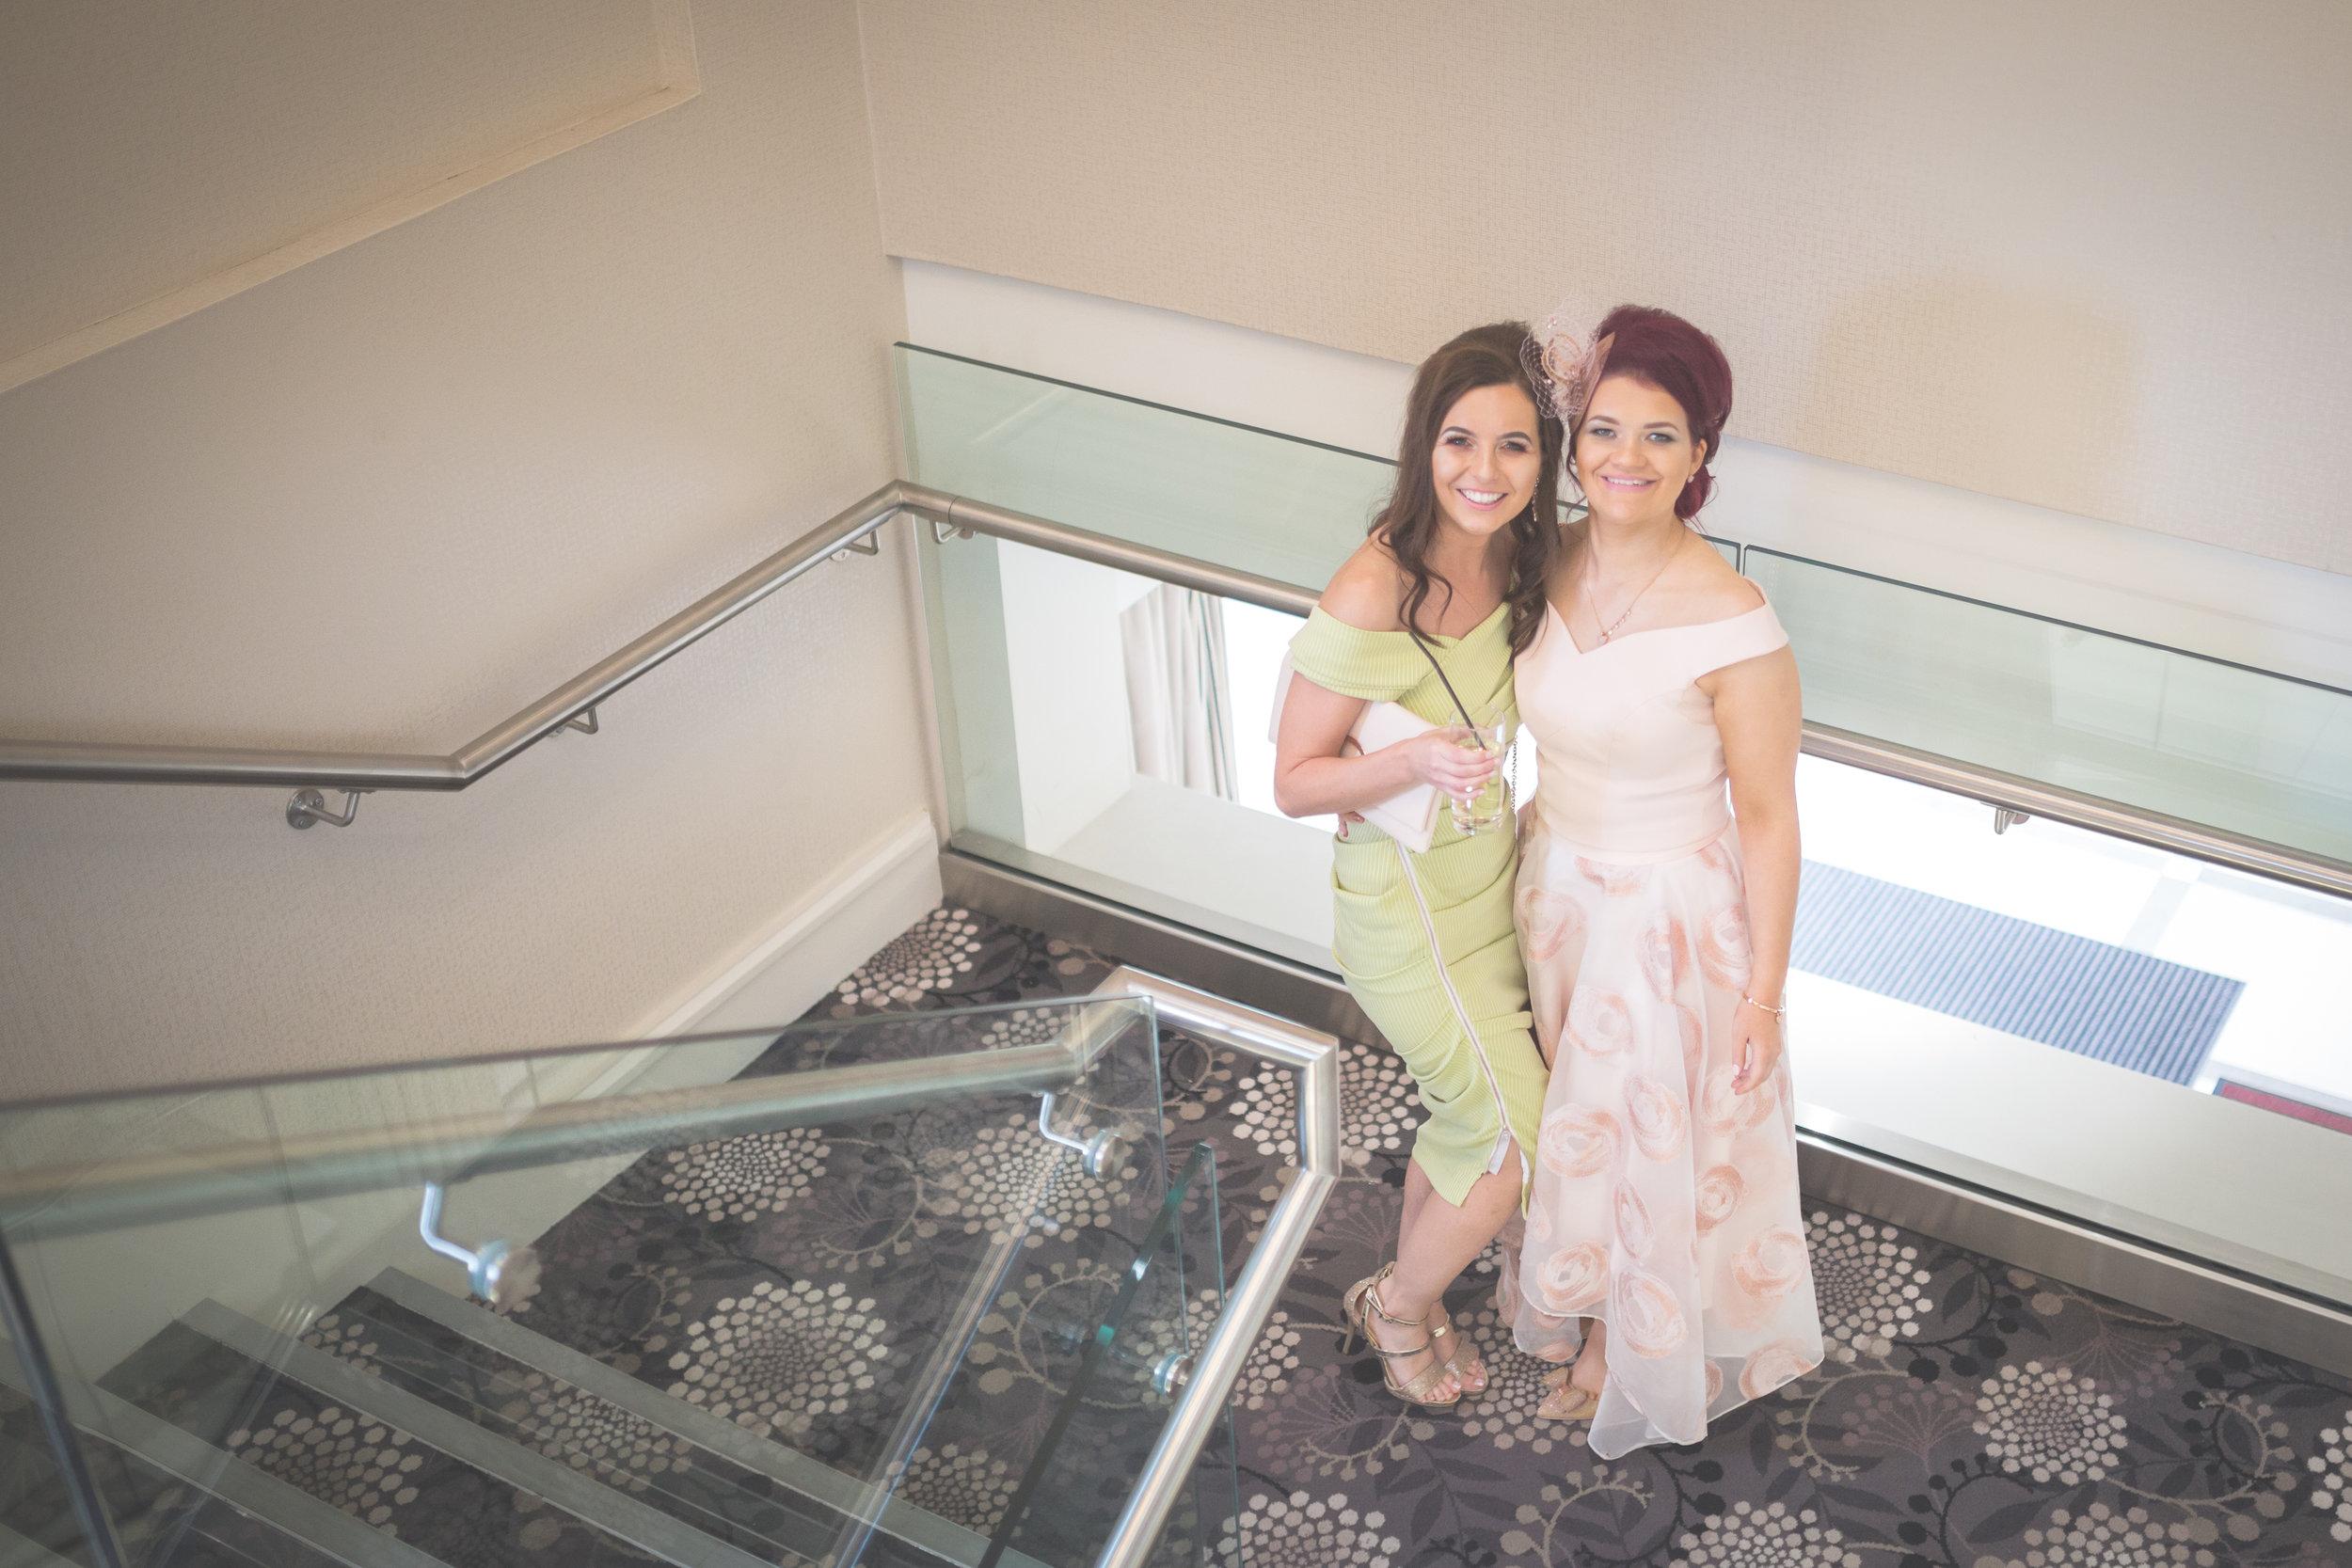 Antoinette & Stephen - Portraits   Brian McEwan Photography   Wedding Photographer Northern Ireland 112.jpg